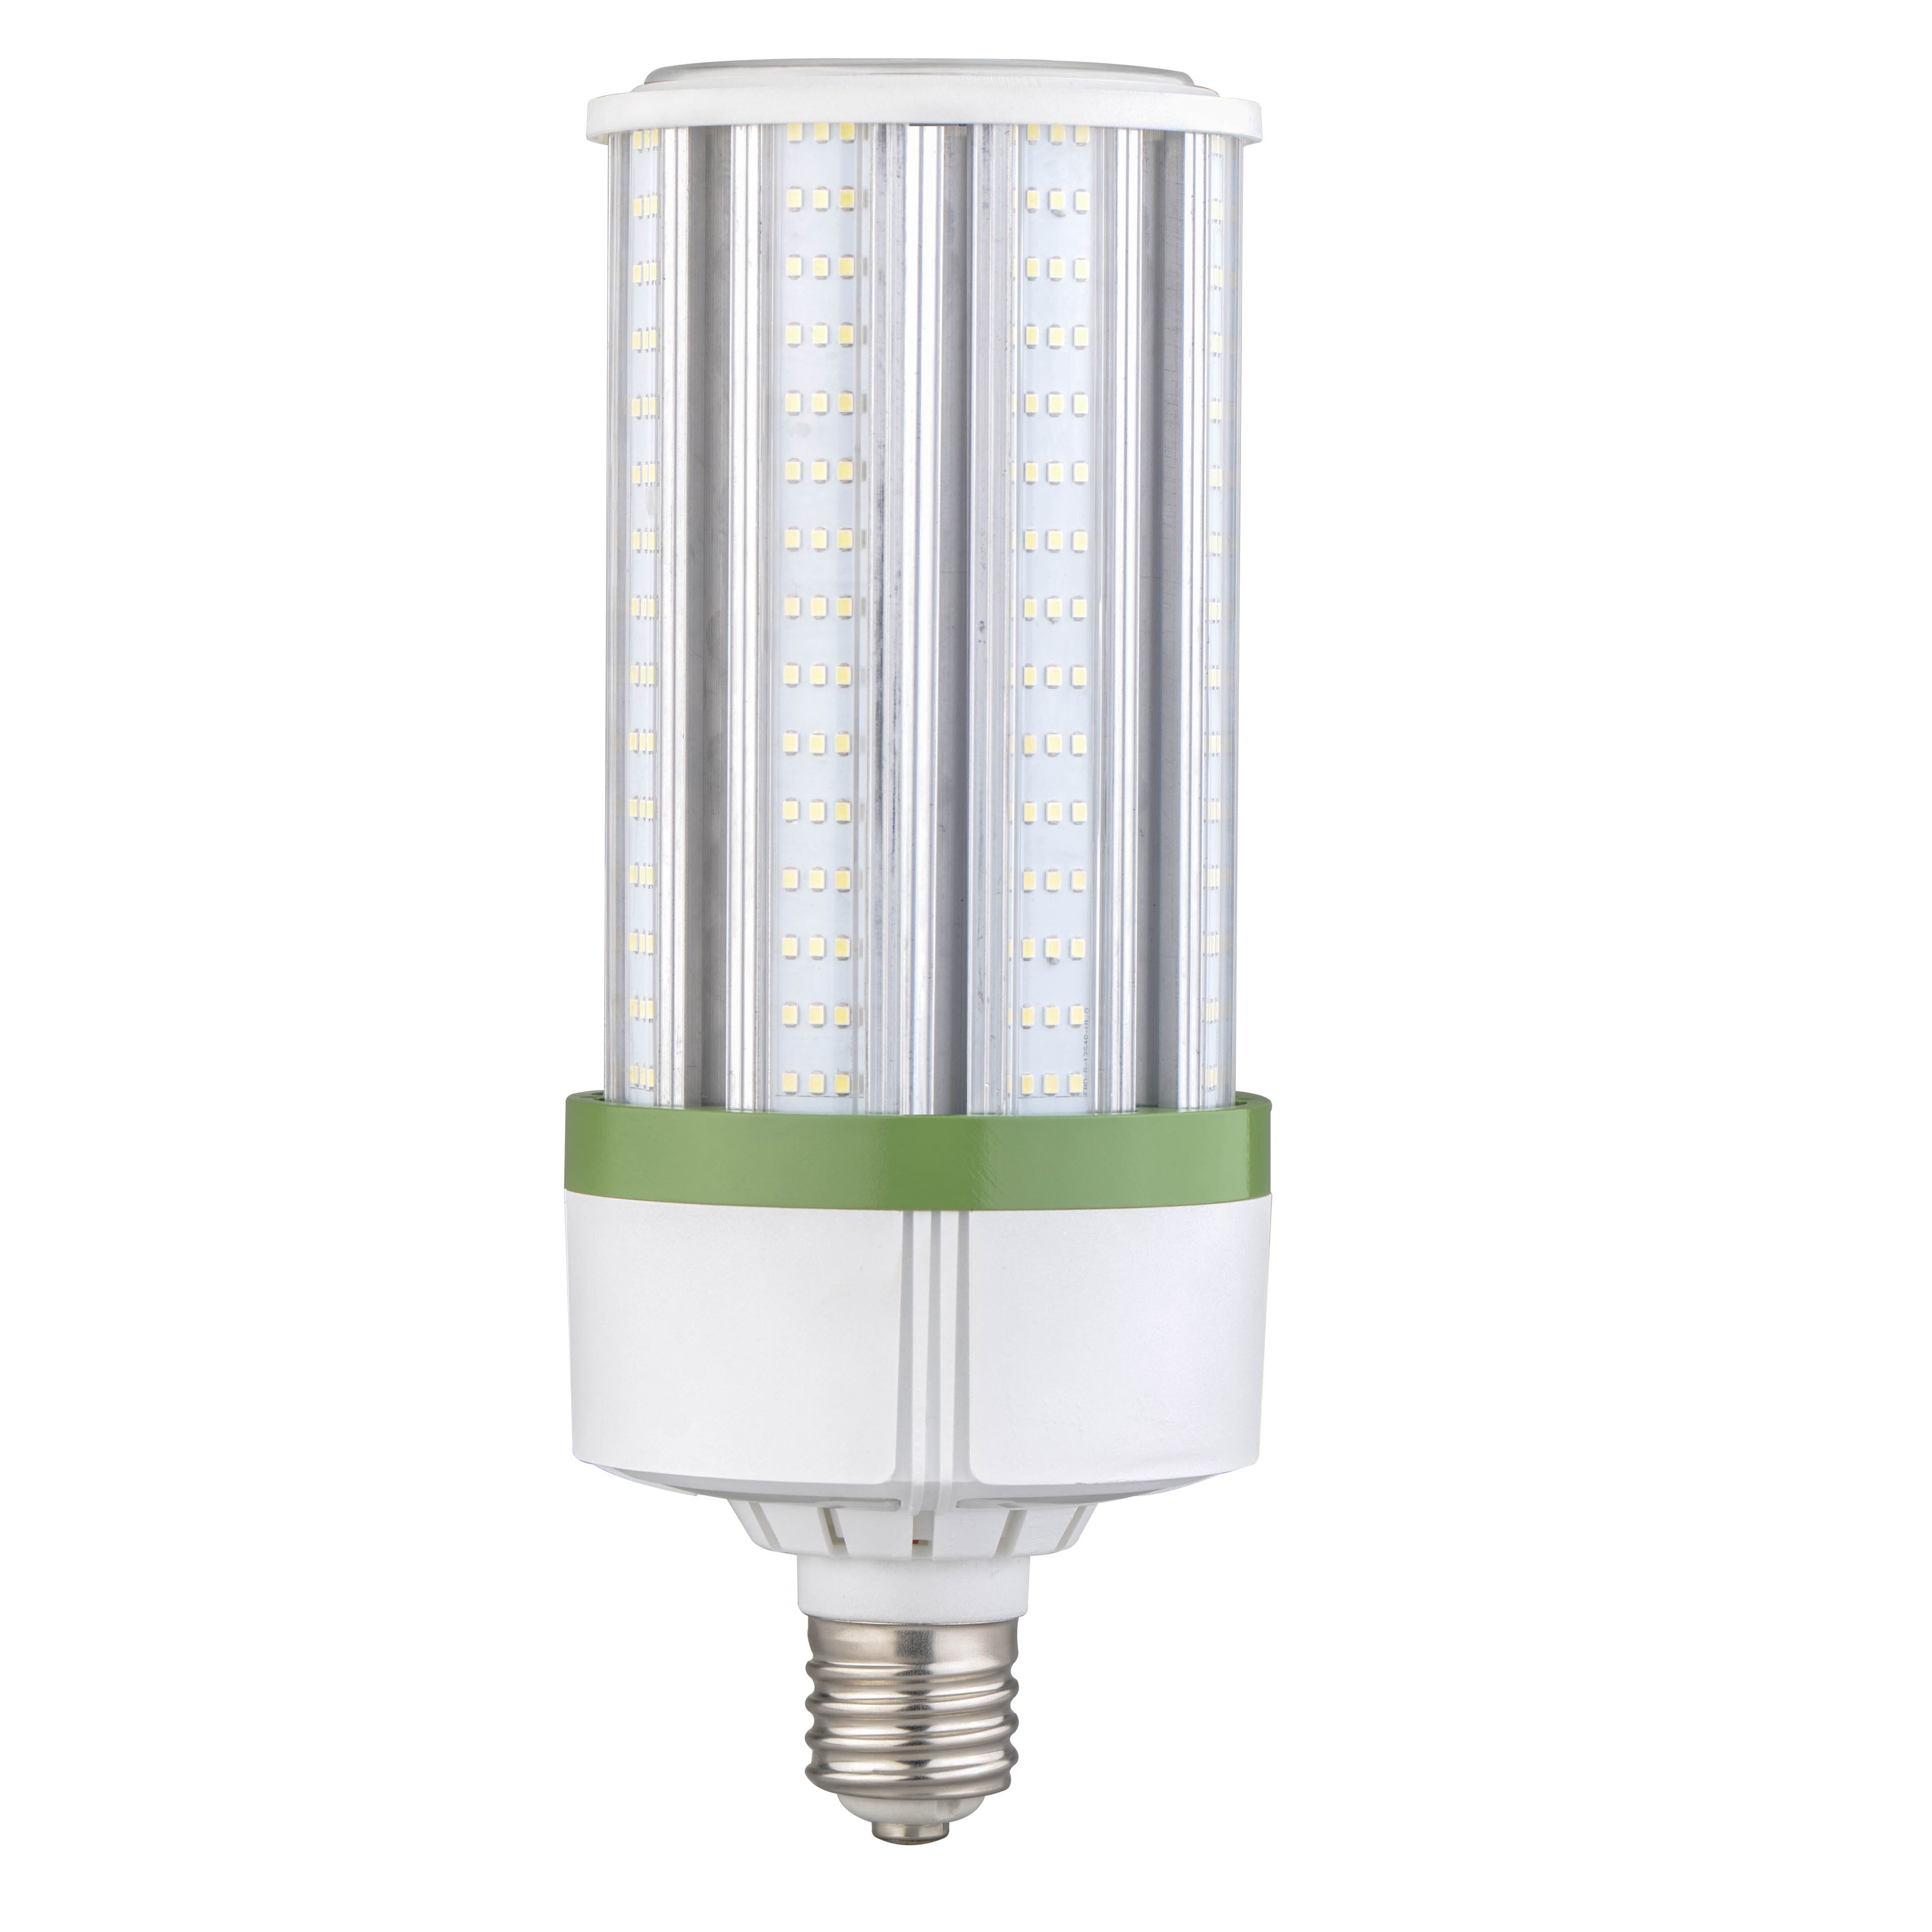 Hot item mogual base 80w led corn bulb lighting replace 250w metal halide lamp